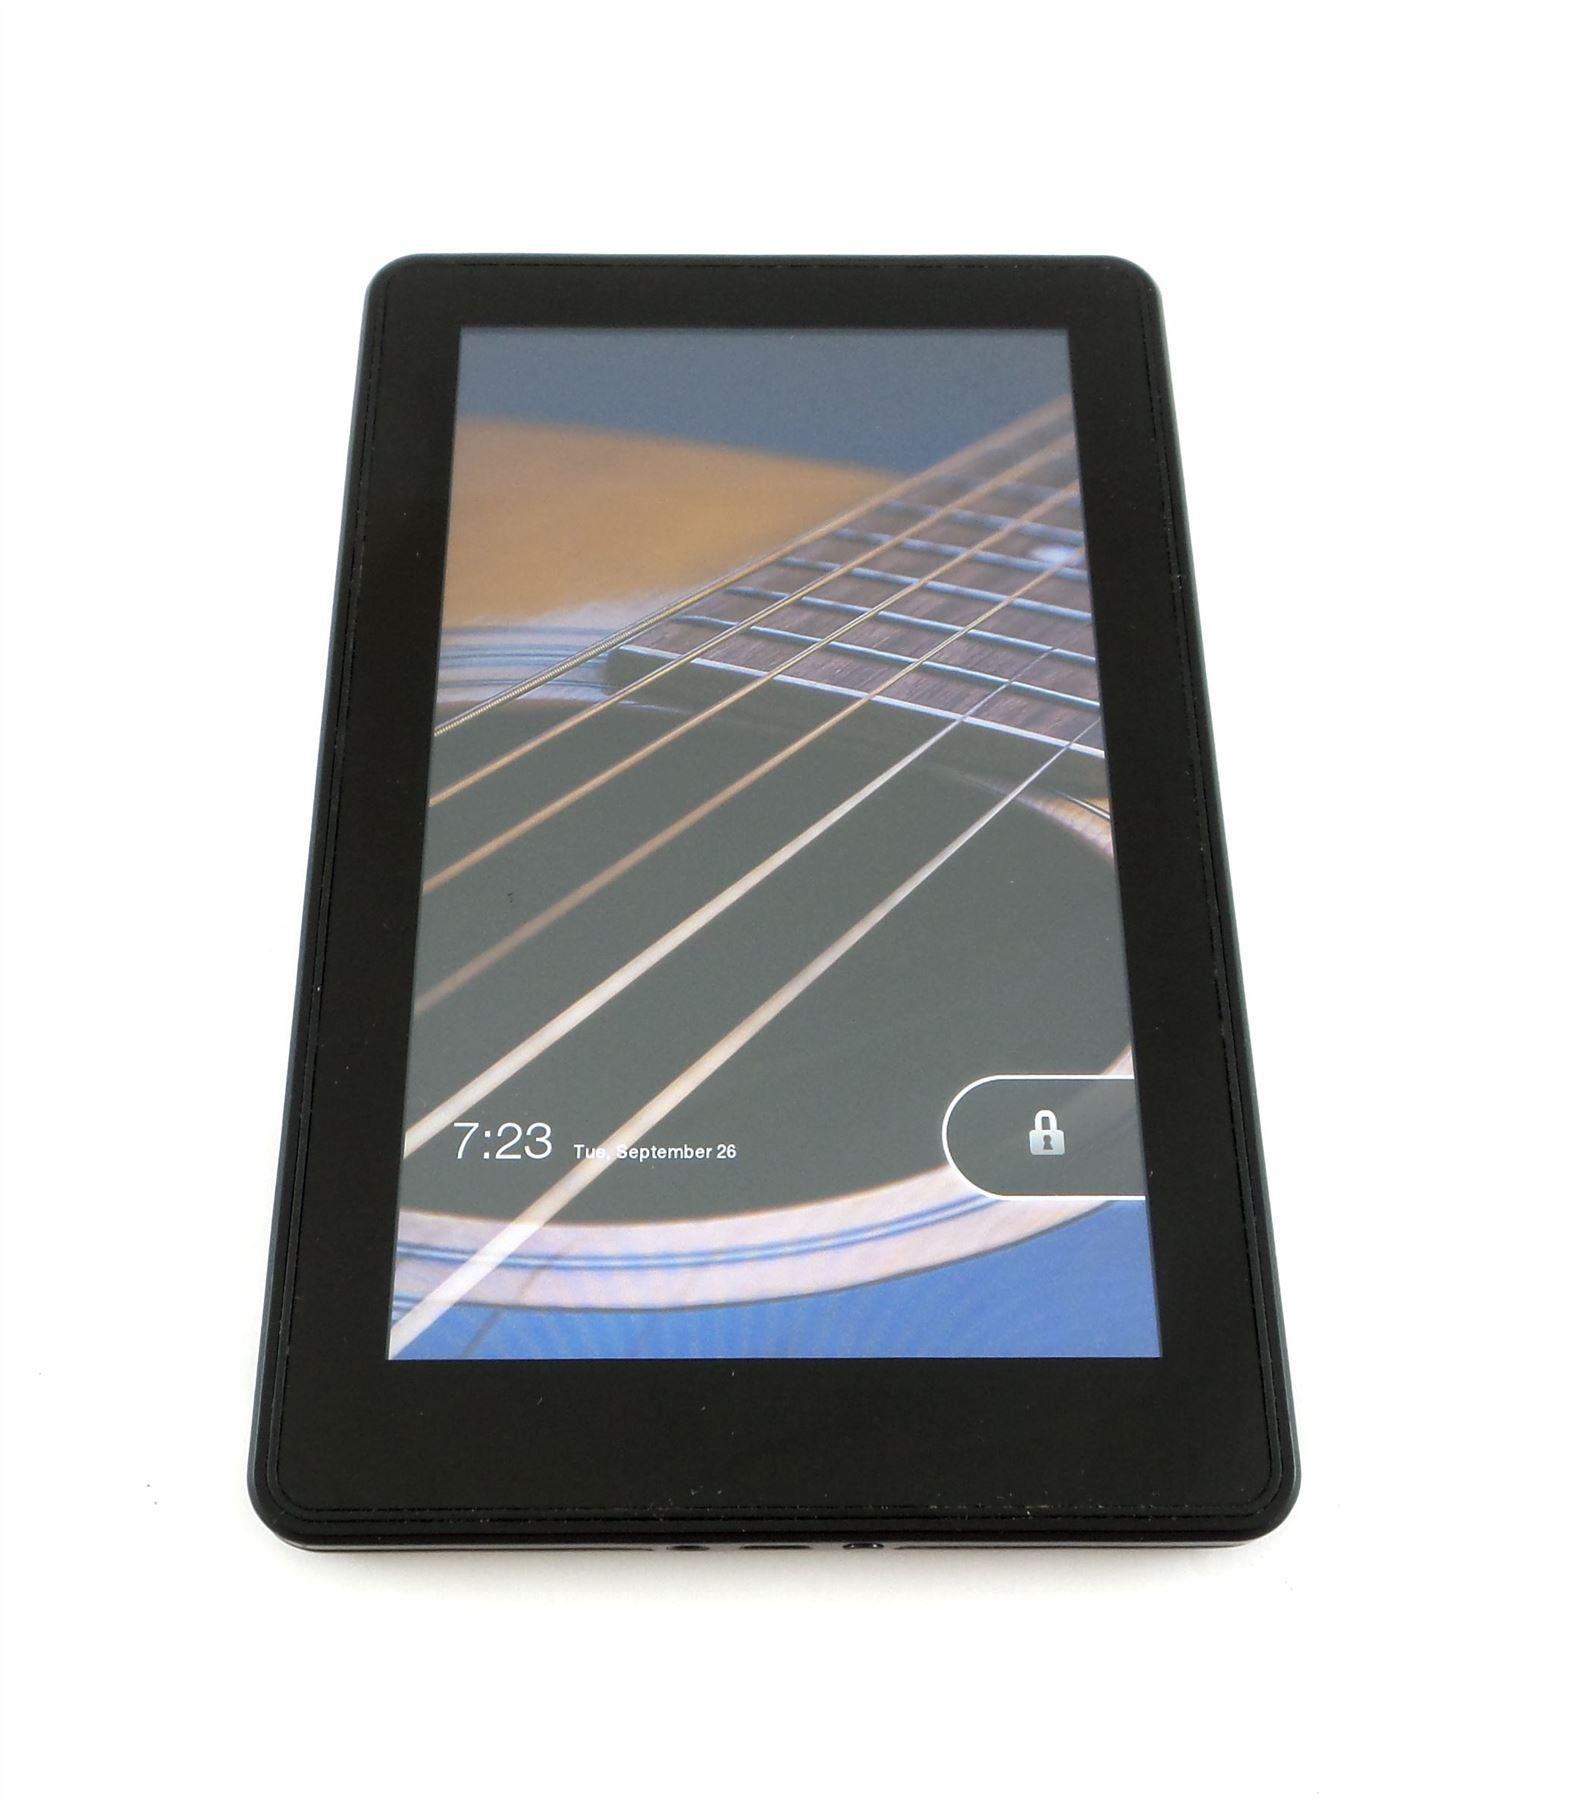 "Amazon Kindle Fire 7"" Tablet 8GB Wi-Fi 1st Generation Black D01400 Bare"